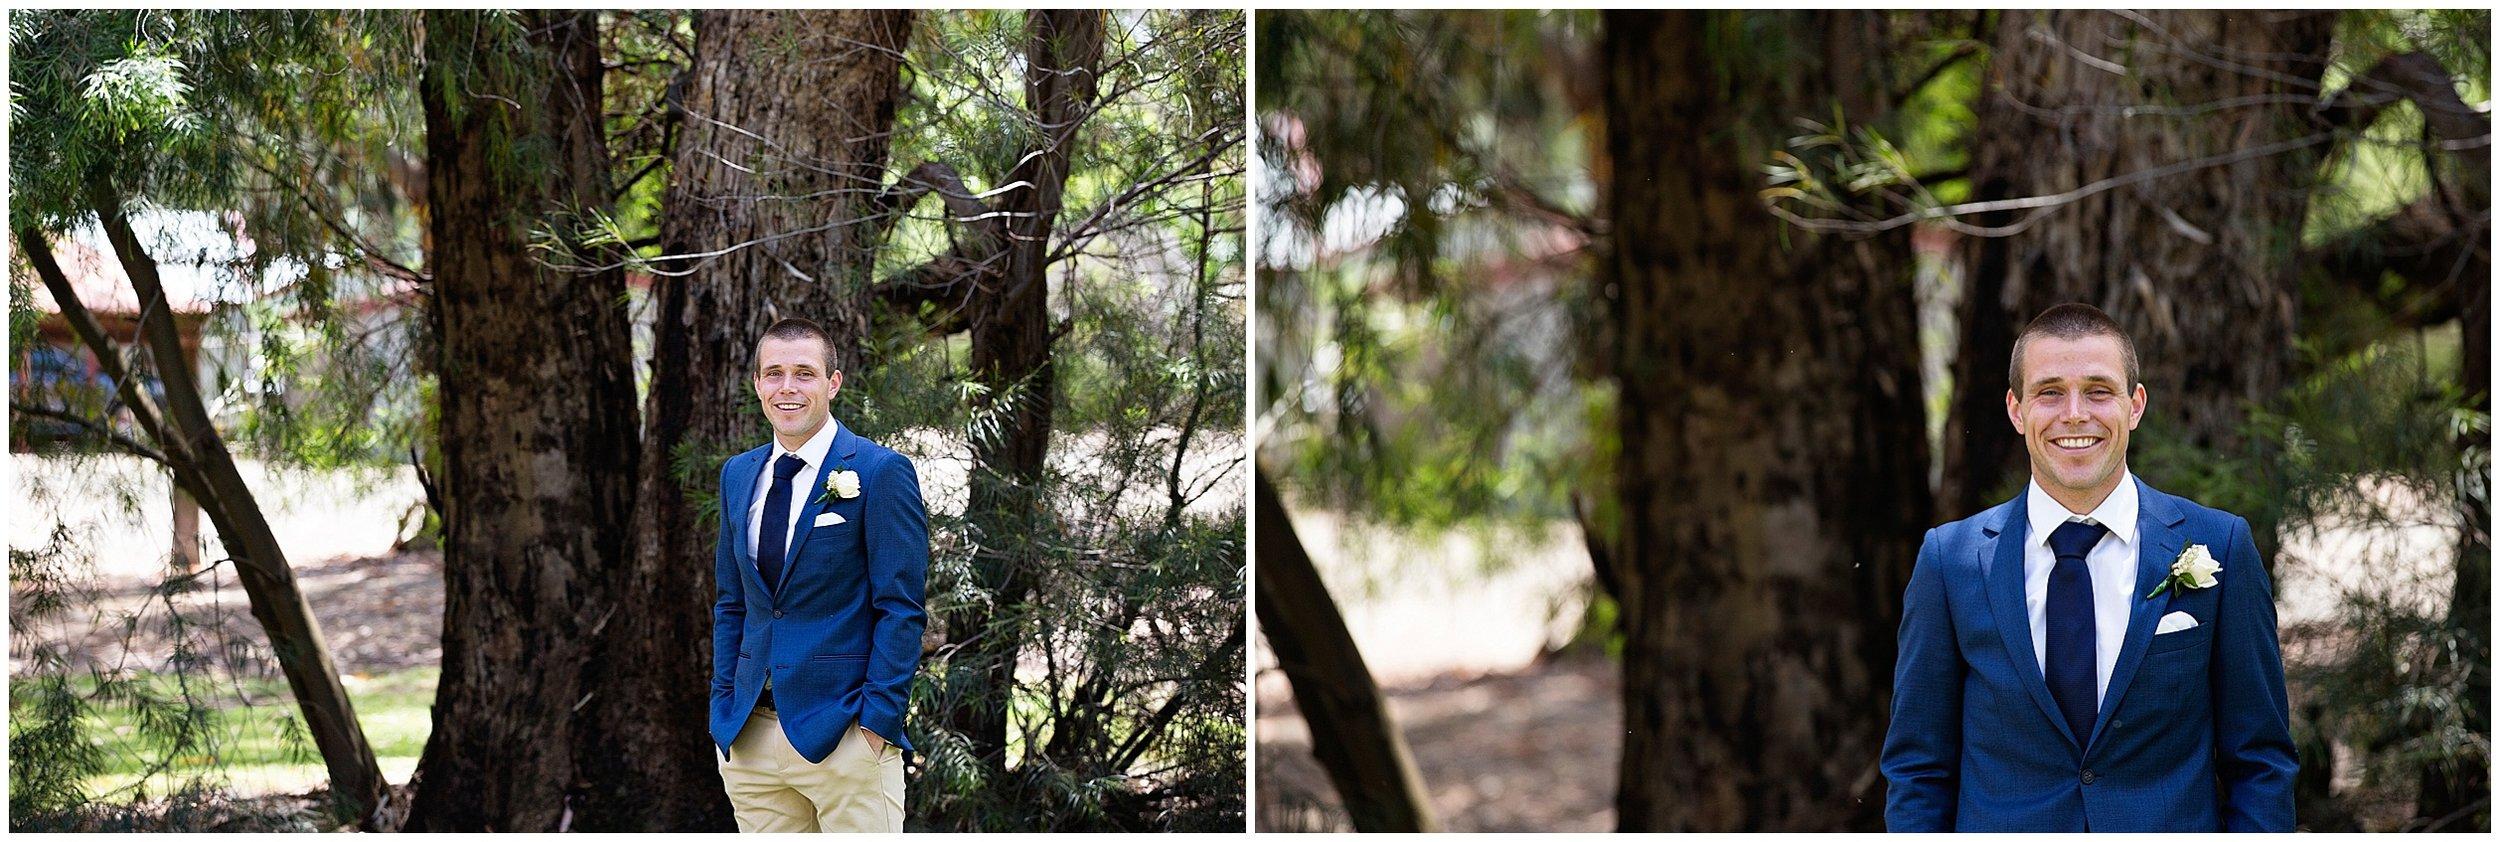 shepparton-wedding-photographer_0074.jpg